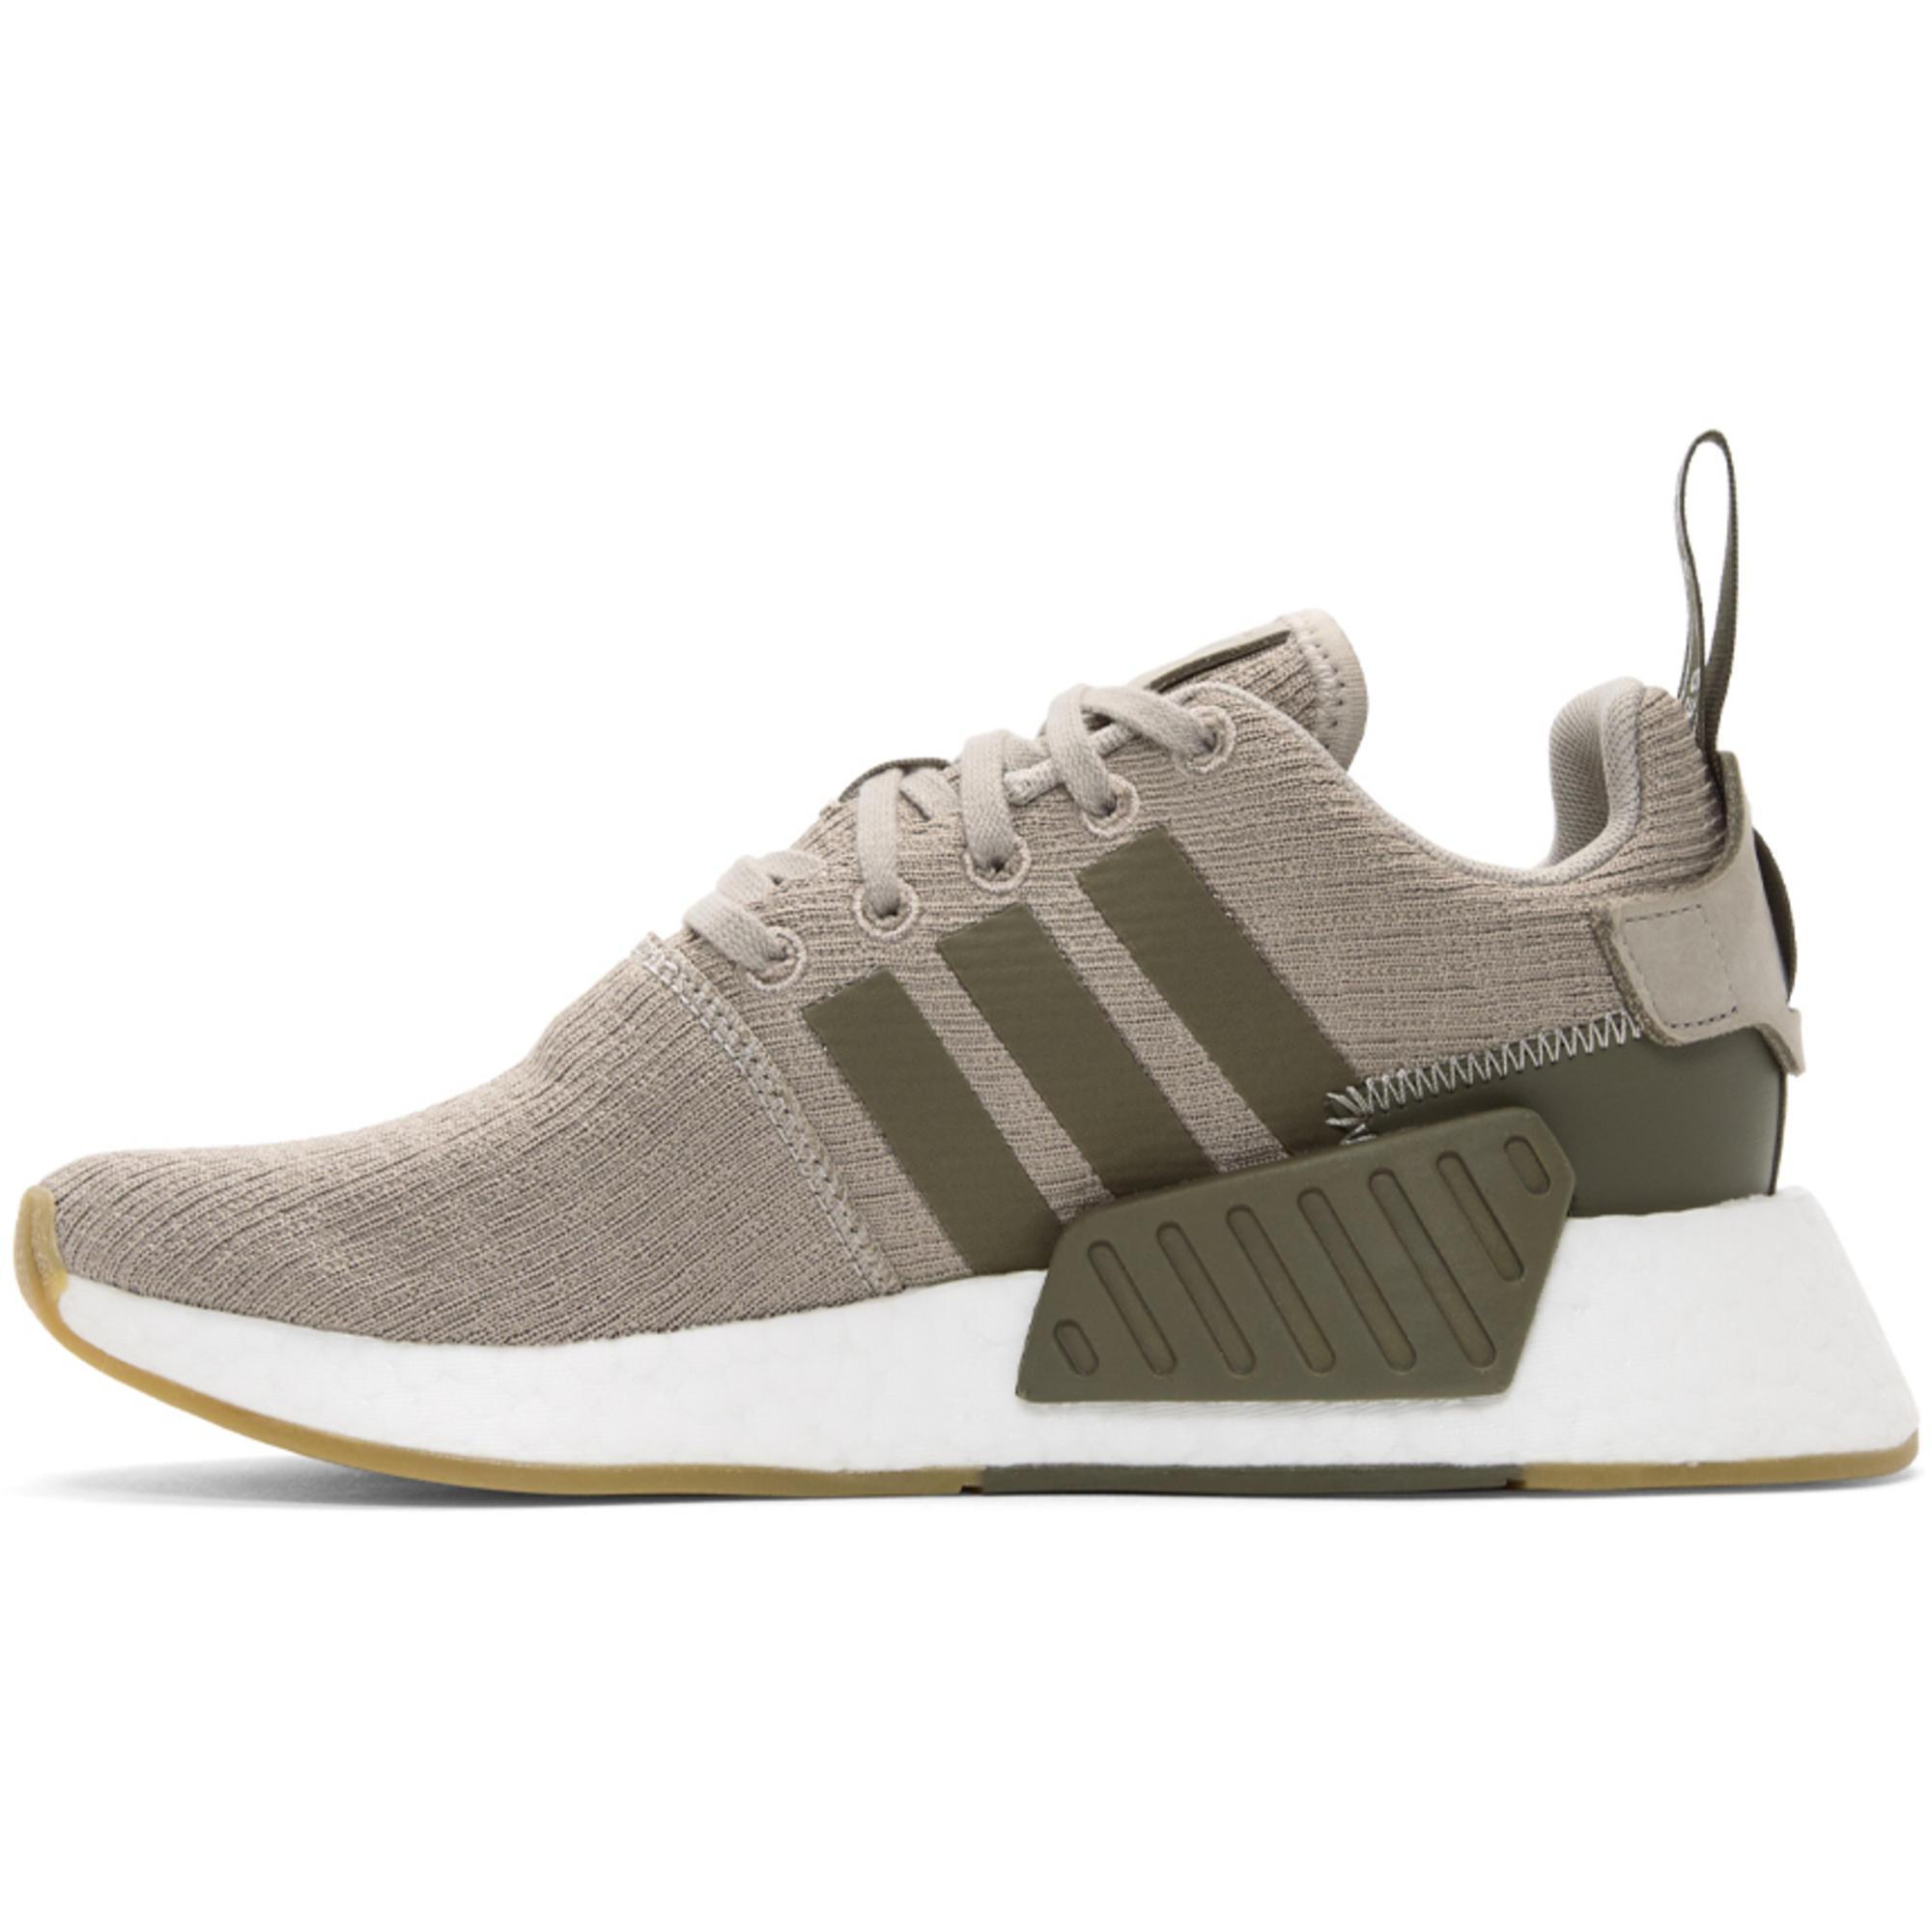 adidas originals sneaker nmd r2 taupe